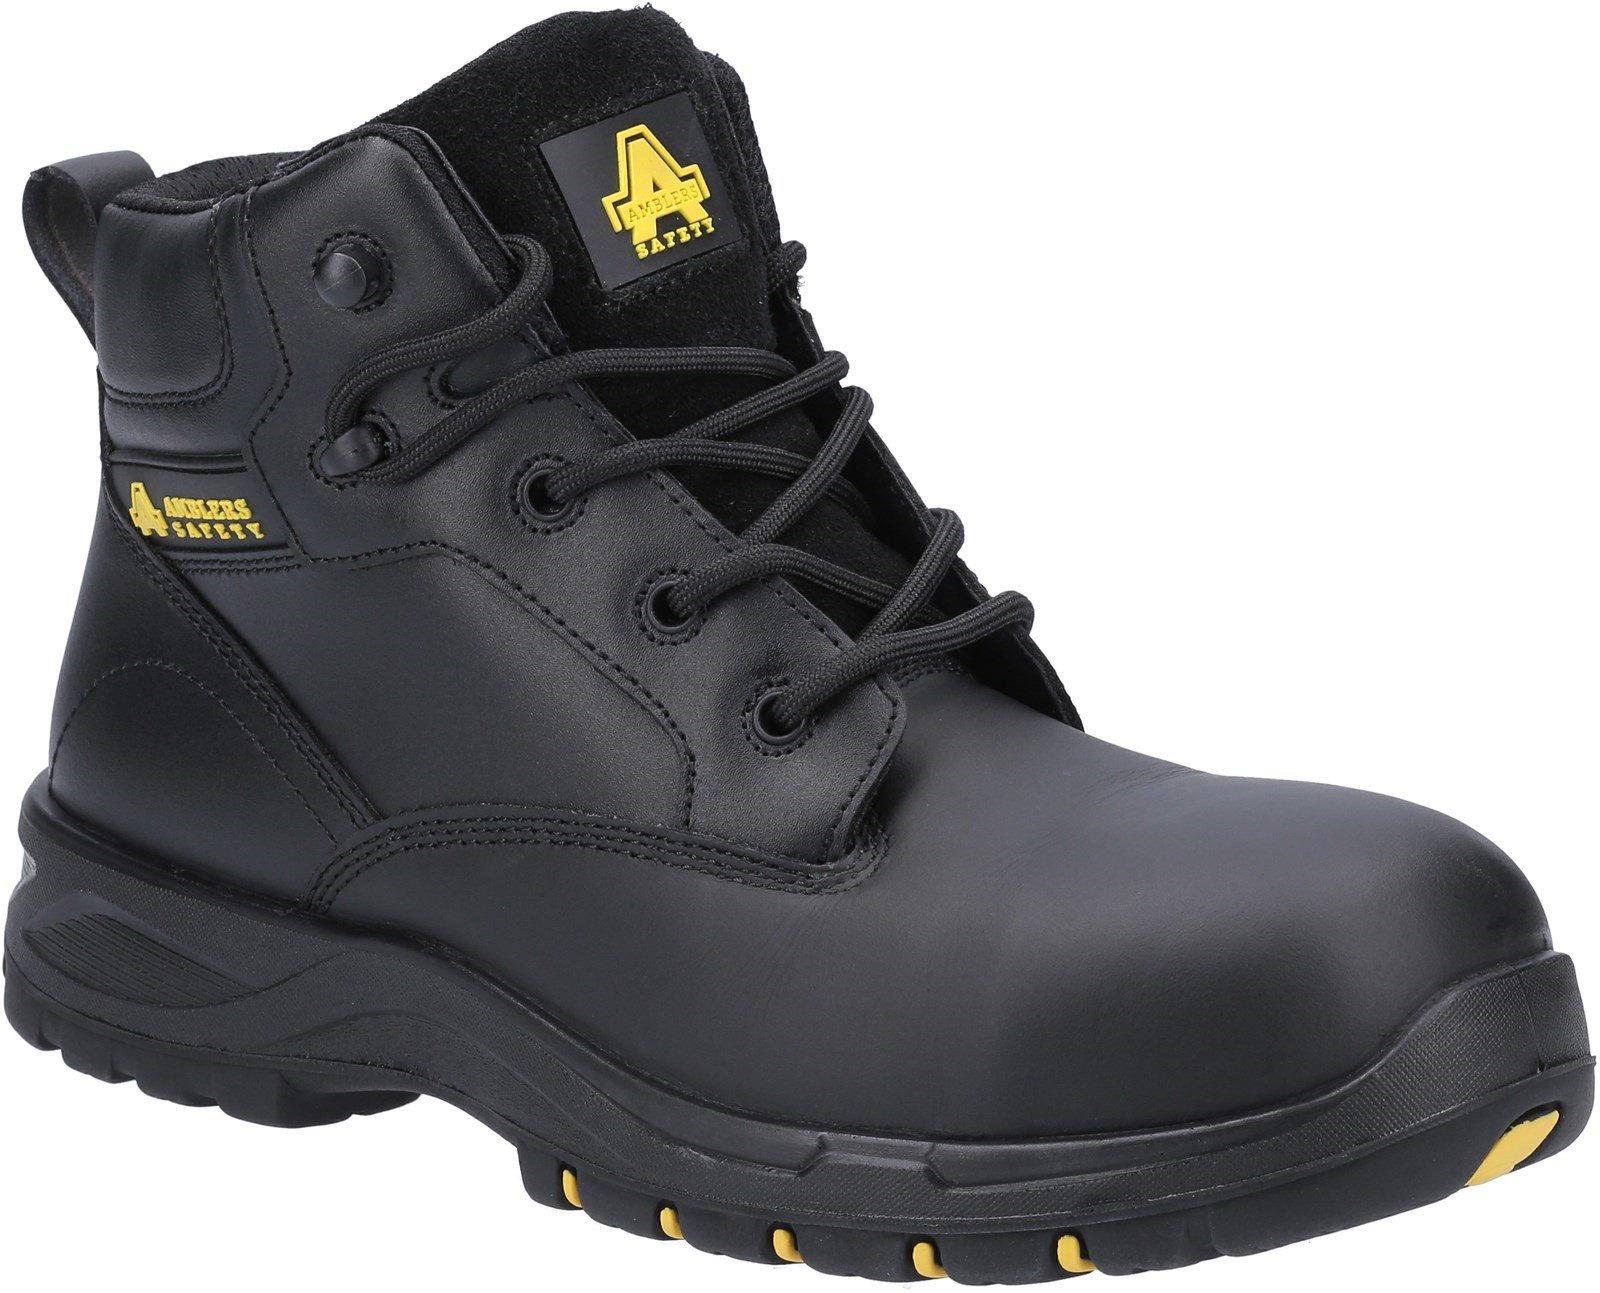 Amblers Safety Women's Boots Black 31375 - Black 3